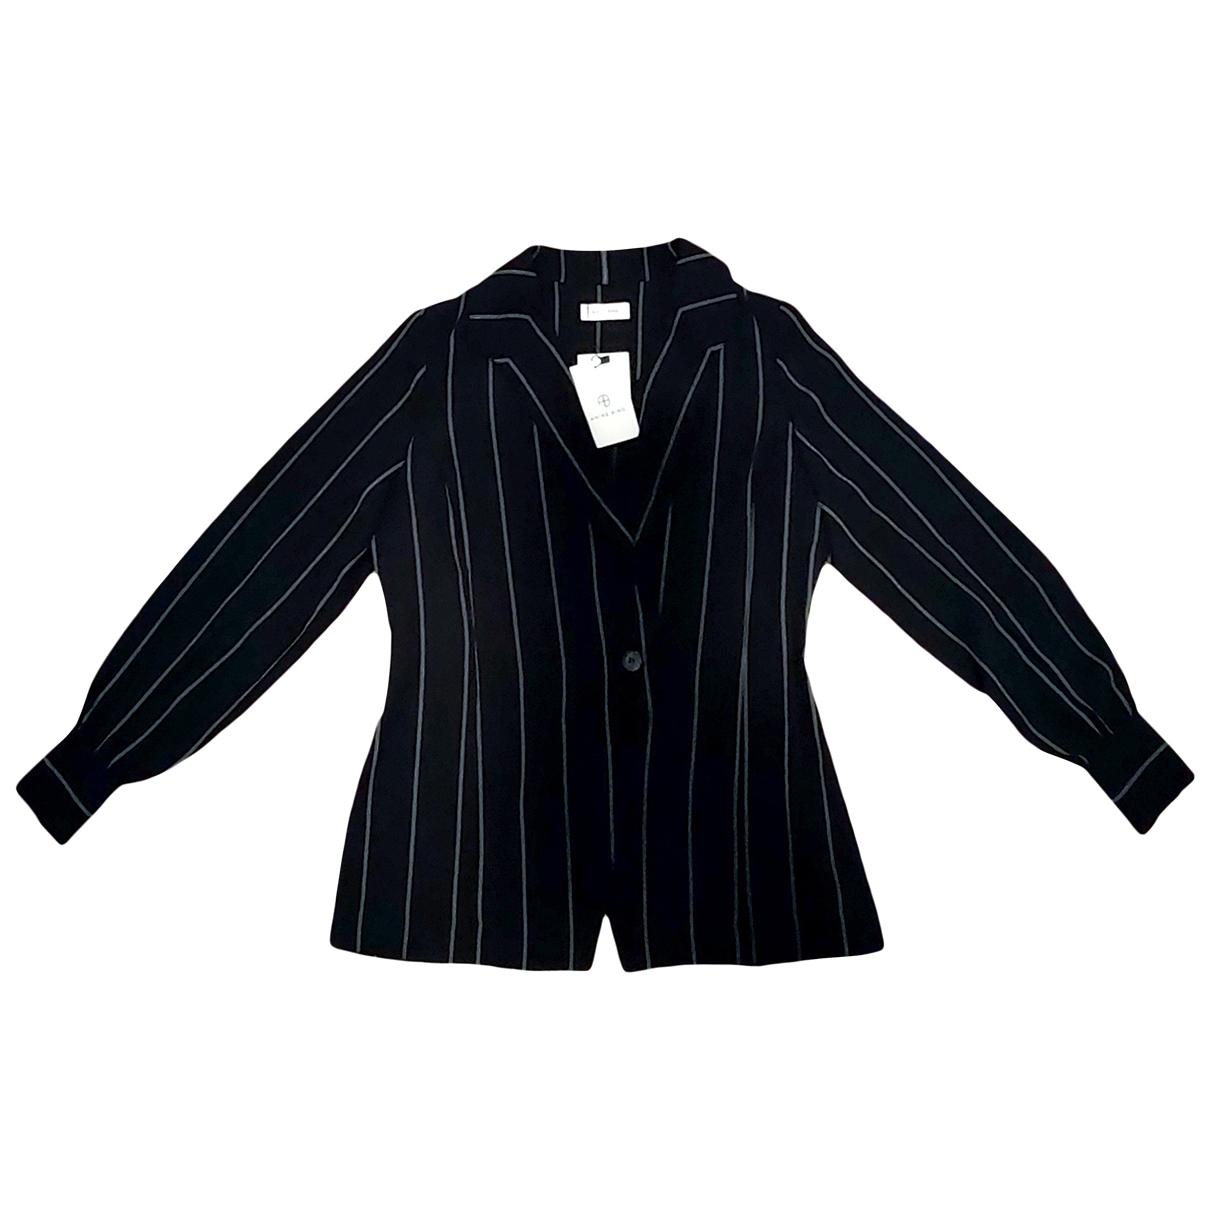 Anine Bing \N Jacke in  Schwarz Polyester